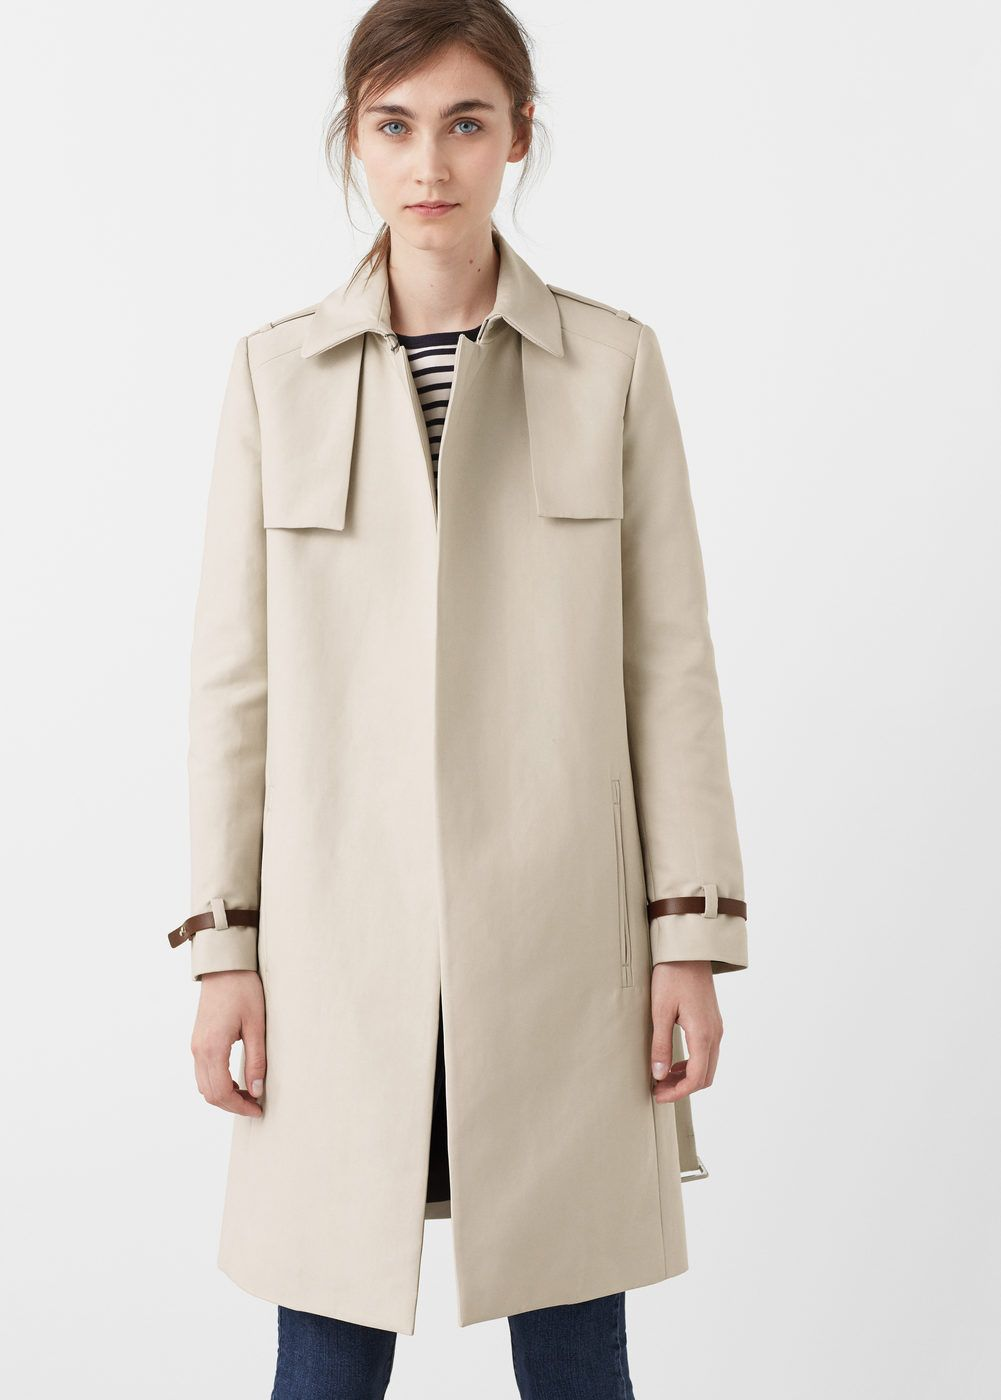 Venta barata buscar oficial originales Trench clásico algodón - Mujer   gabardinas   Abrigos, Moda ...